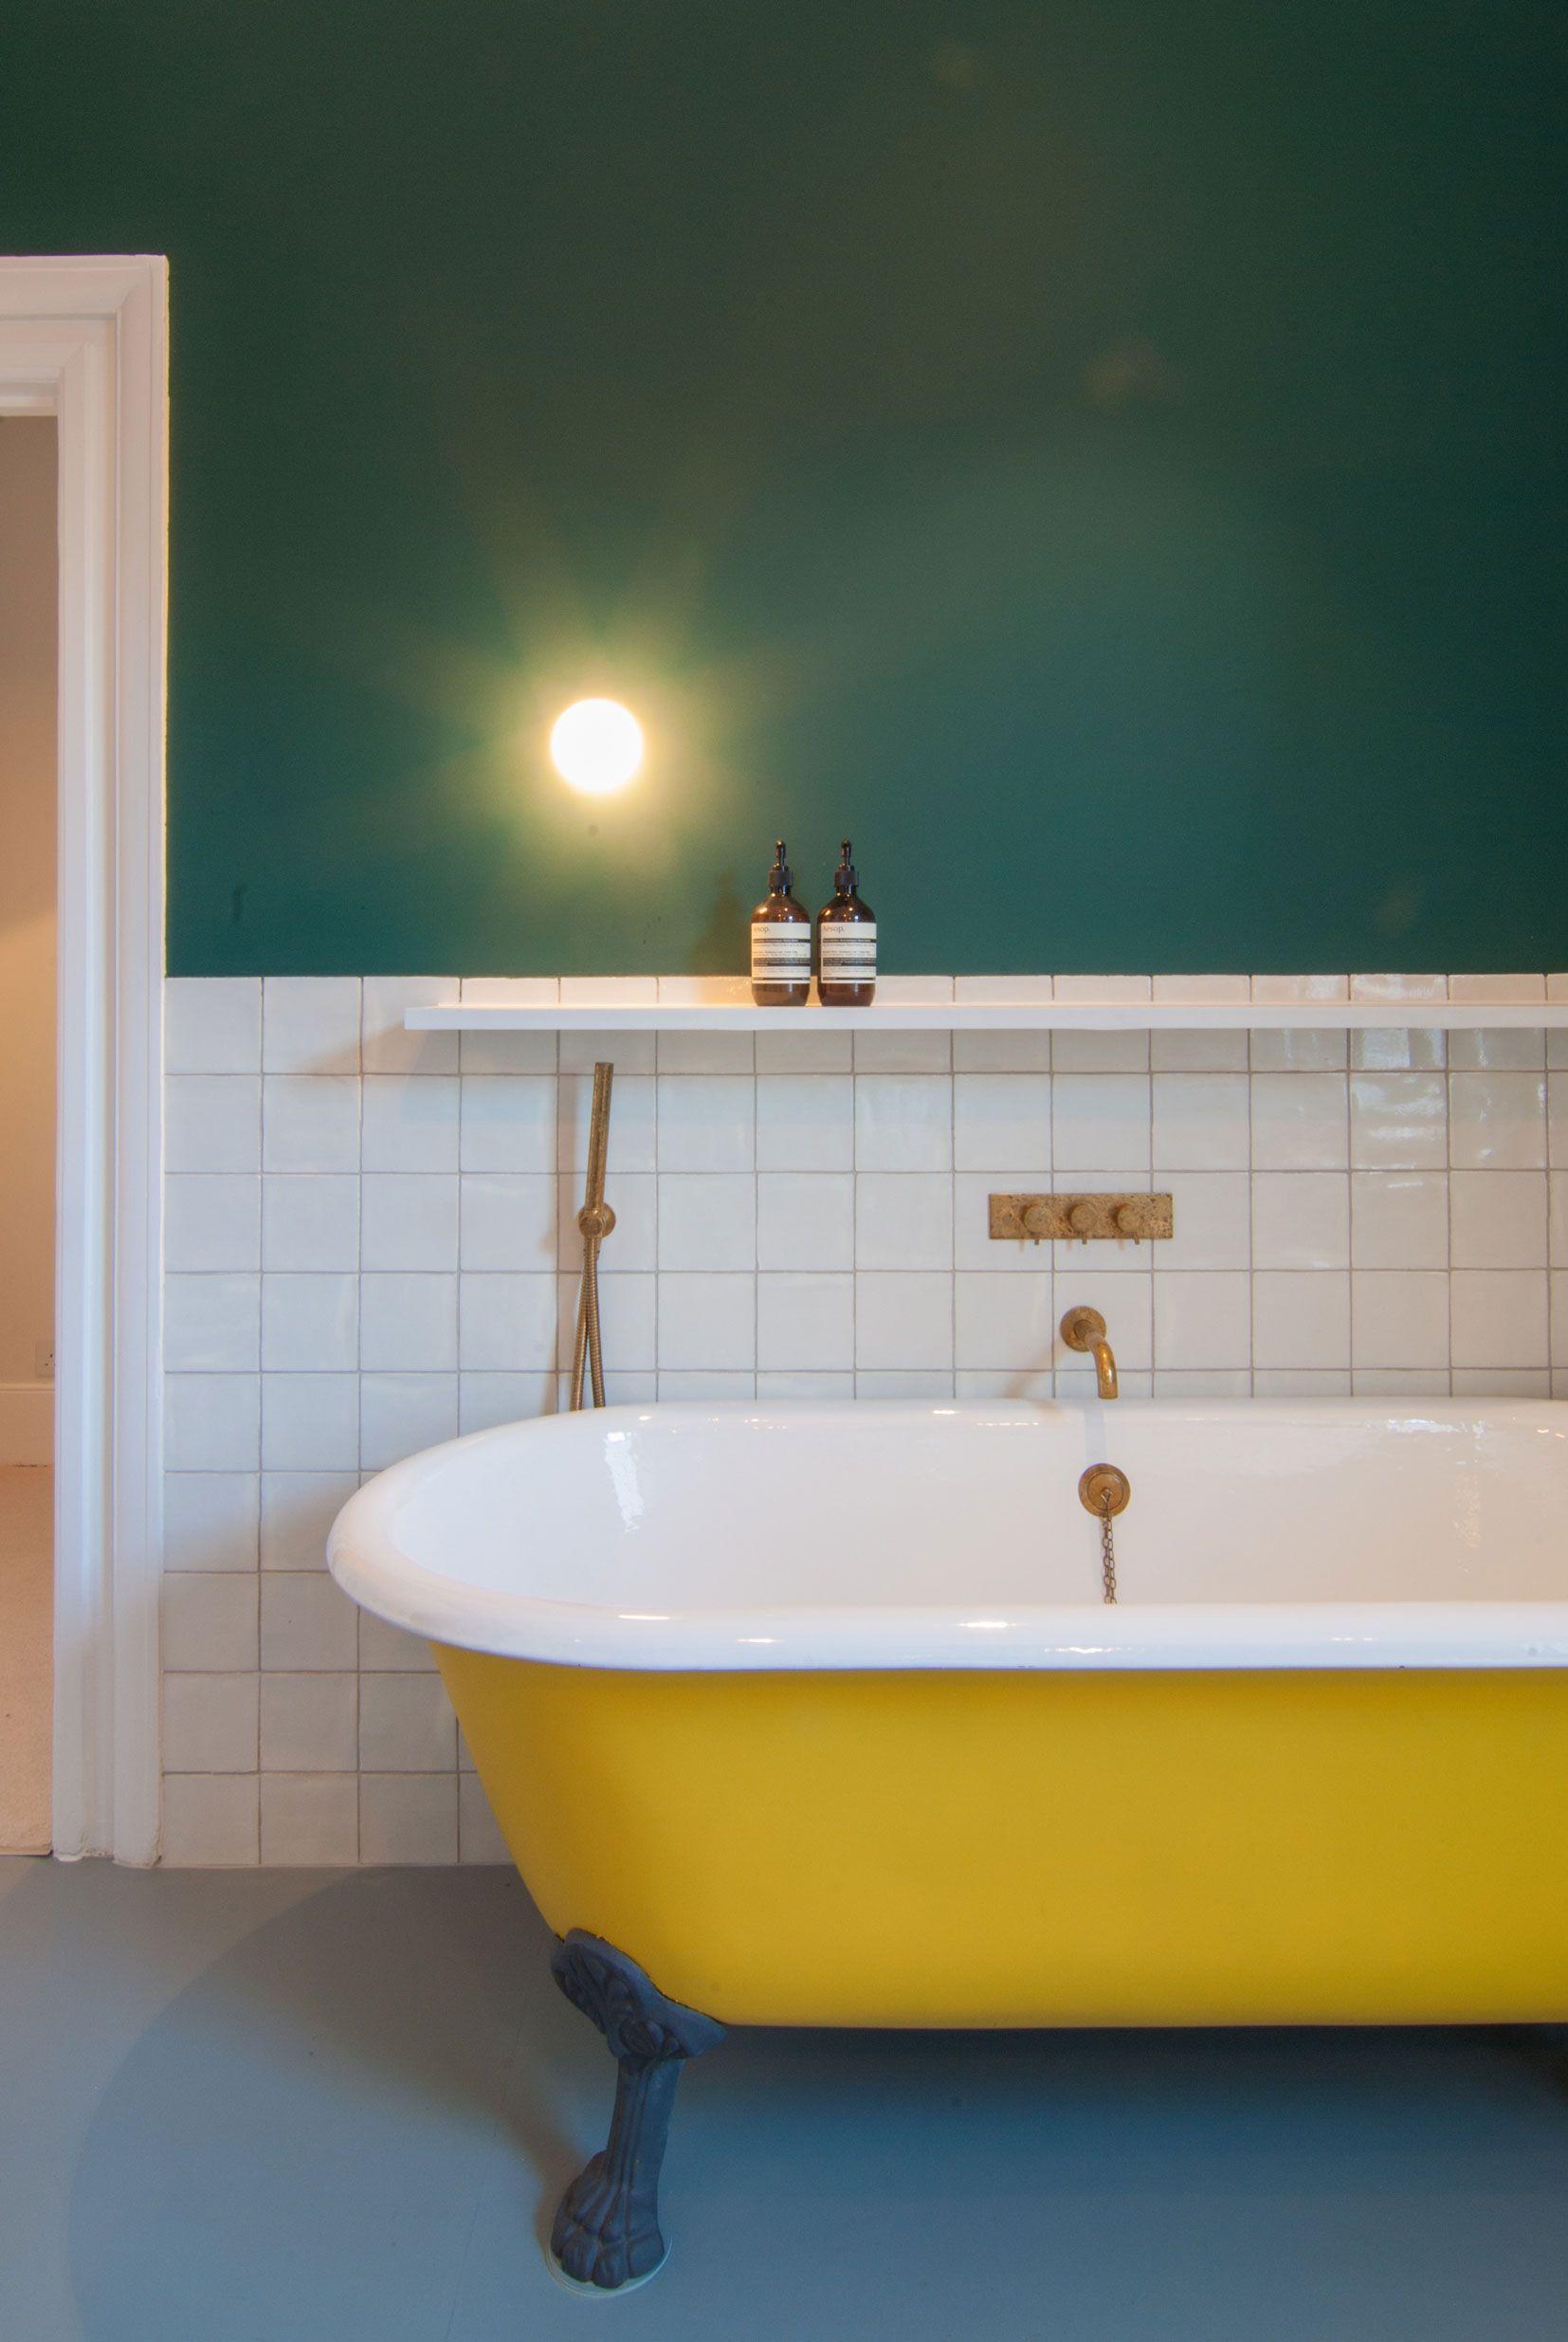 Yellow Bath Dark Green Wall Gold Bath Fittings White Tiles Bathroom Yellow Bathroom Decor Yellow Bathrooms Teal Bathroom